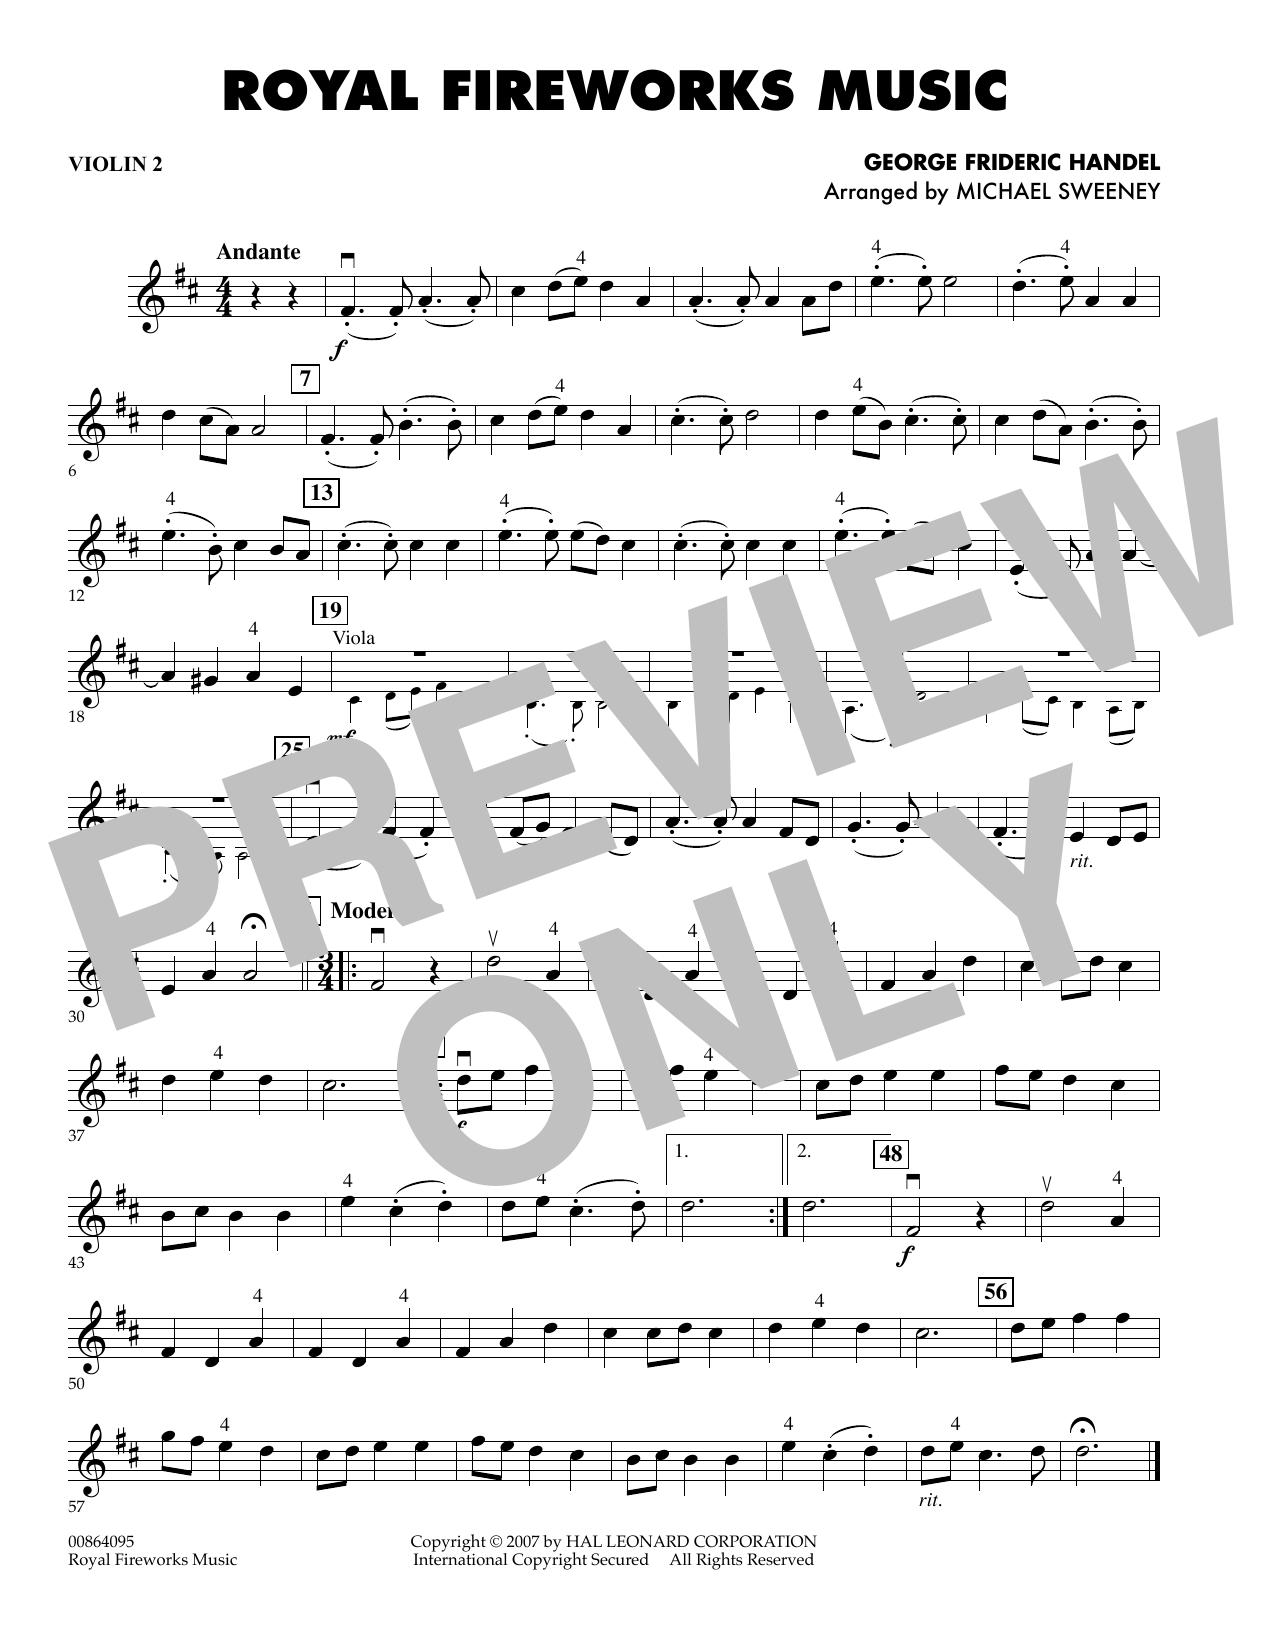 Royal Fireworks Music - Violin 2 (Orchestra)